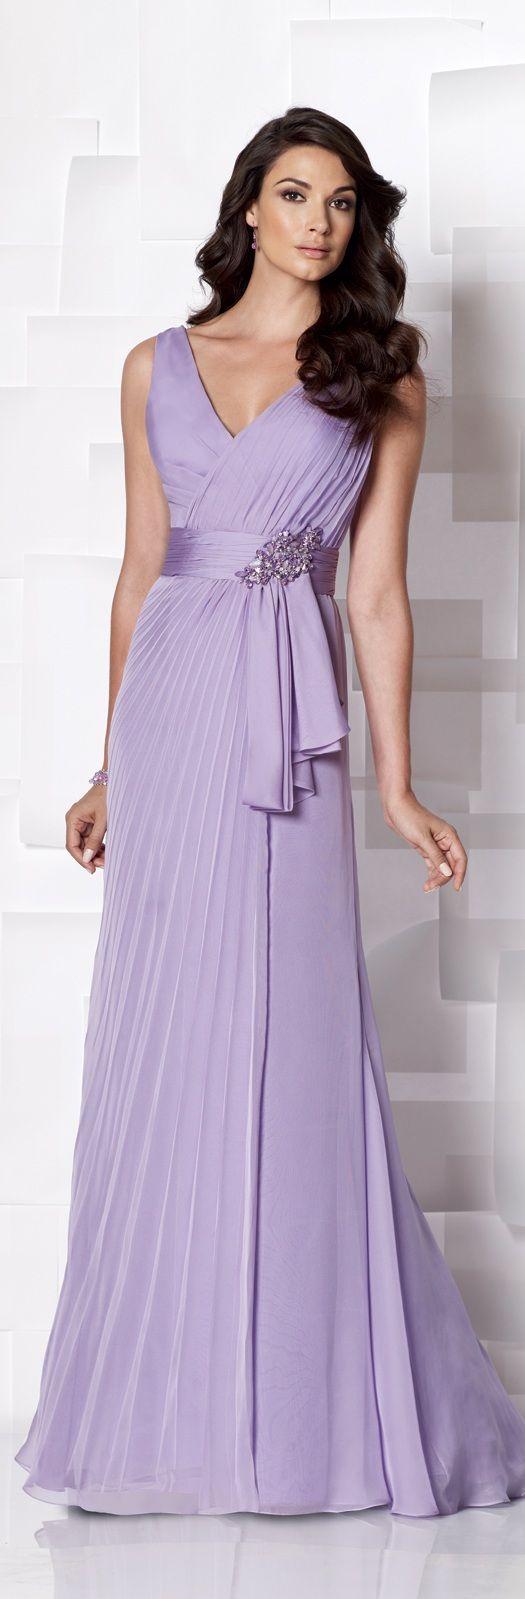 Cameron Blake haute couture 2013/2014 ~ #josephine#vogel